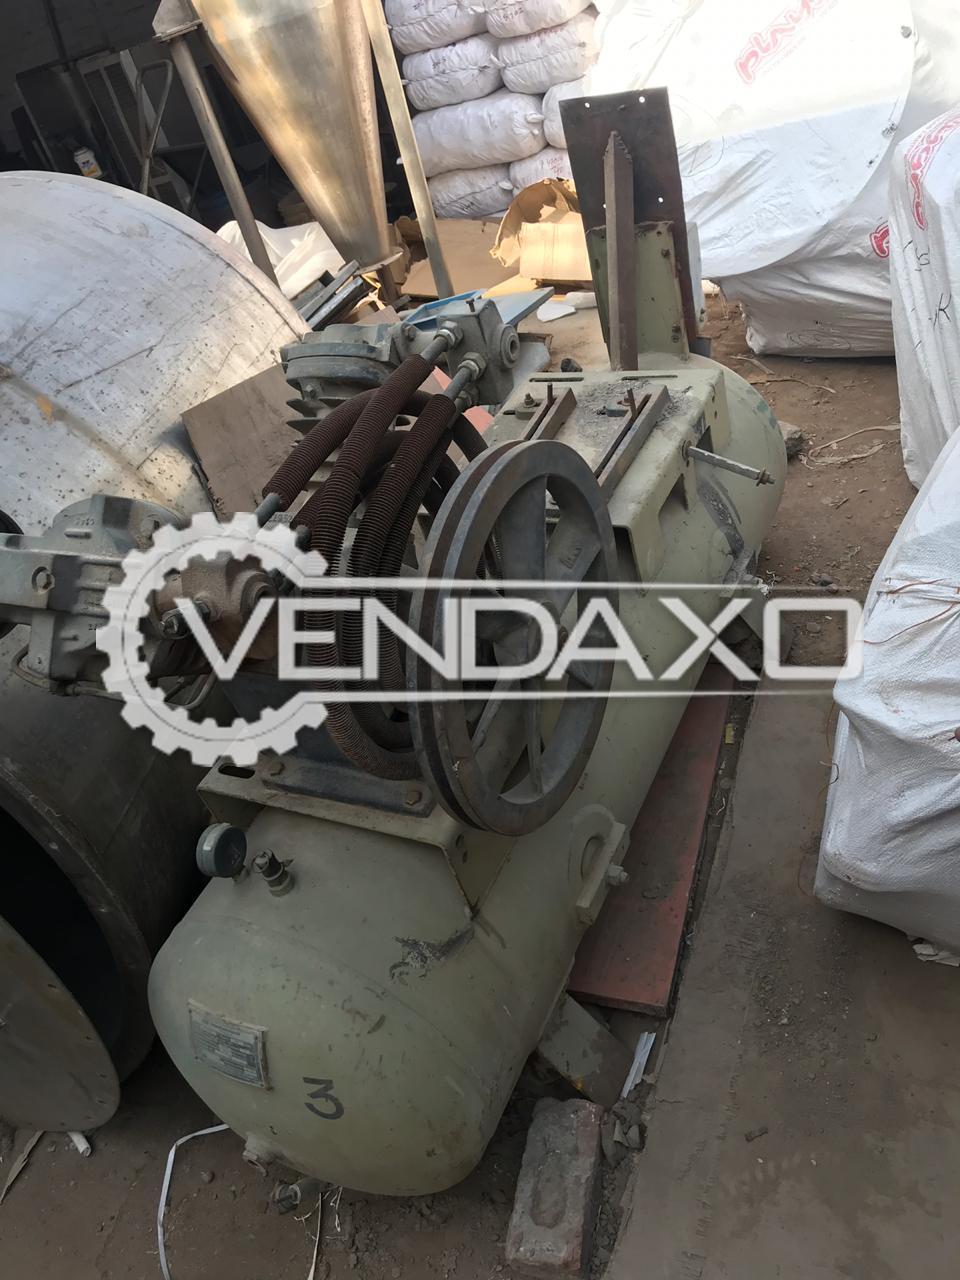 Ingersoll Rand Air Compressor -  300 Liter, 10 HP